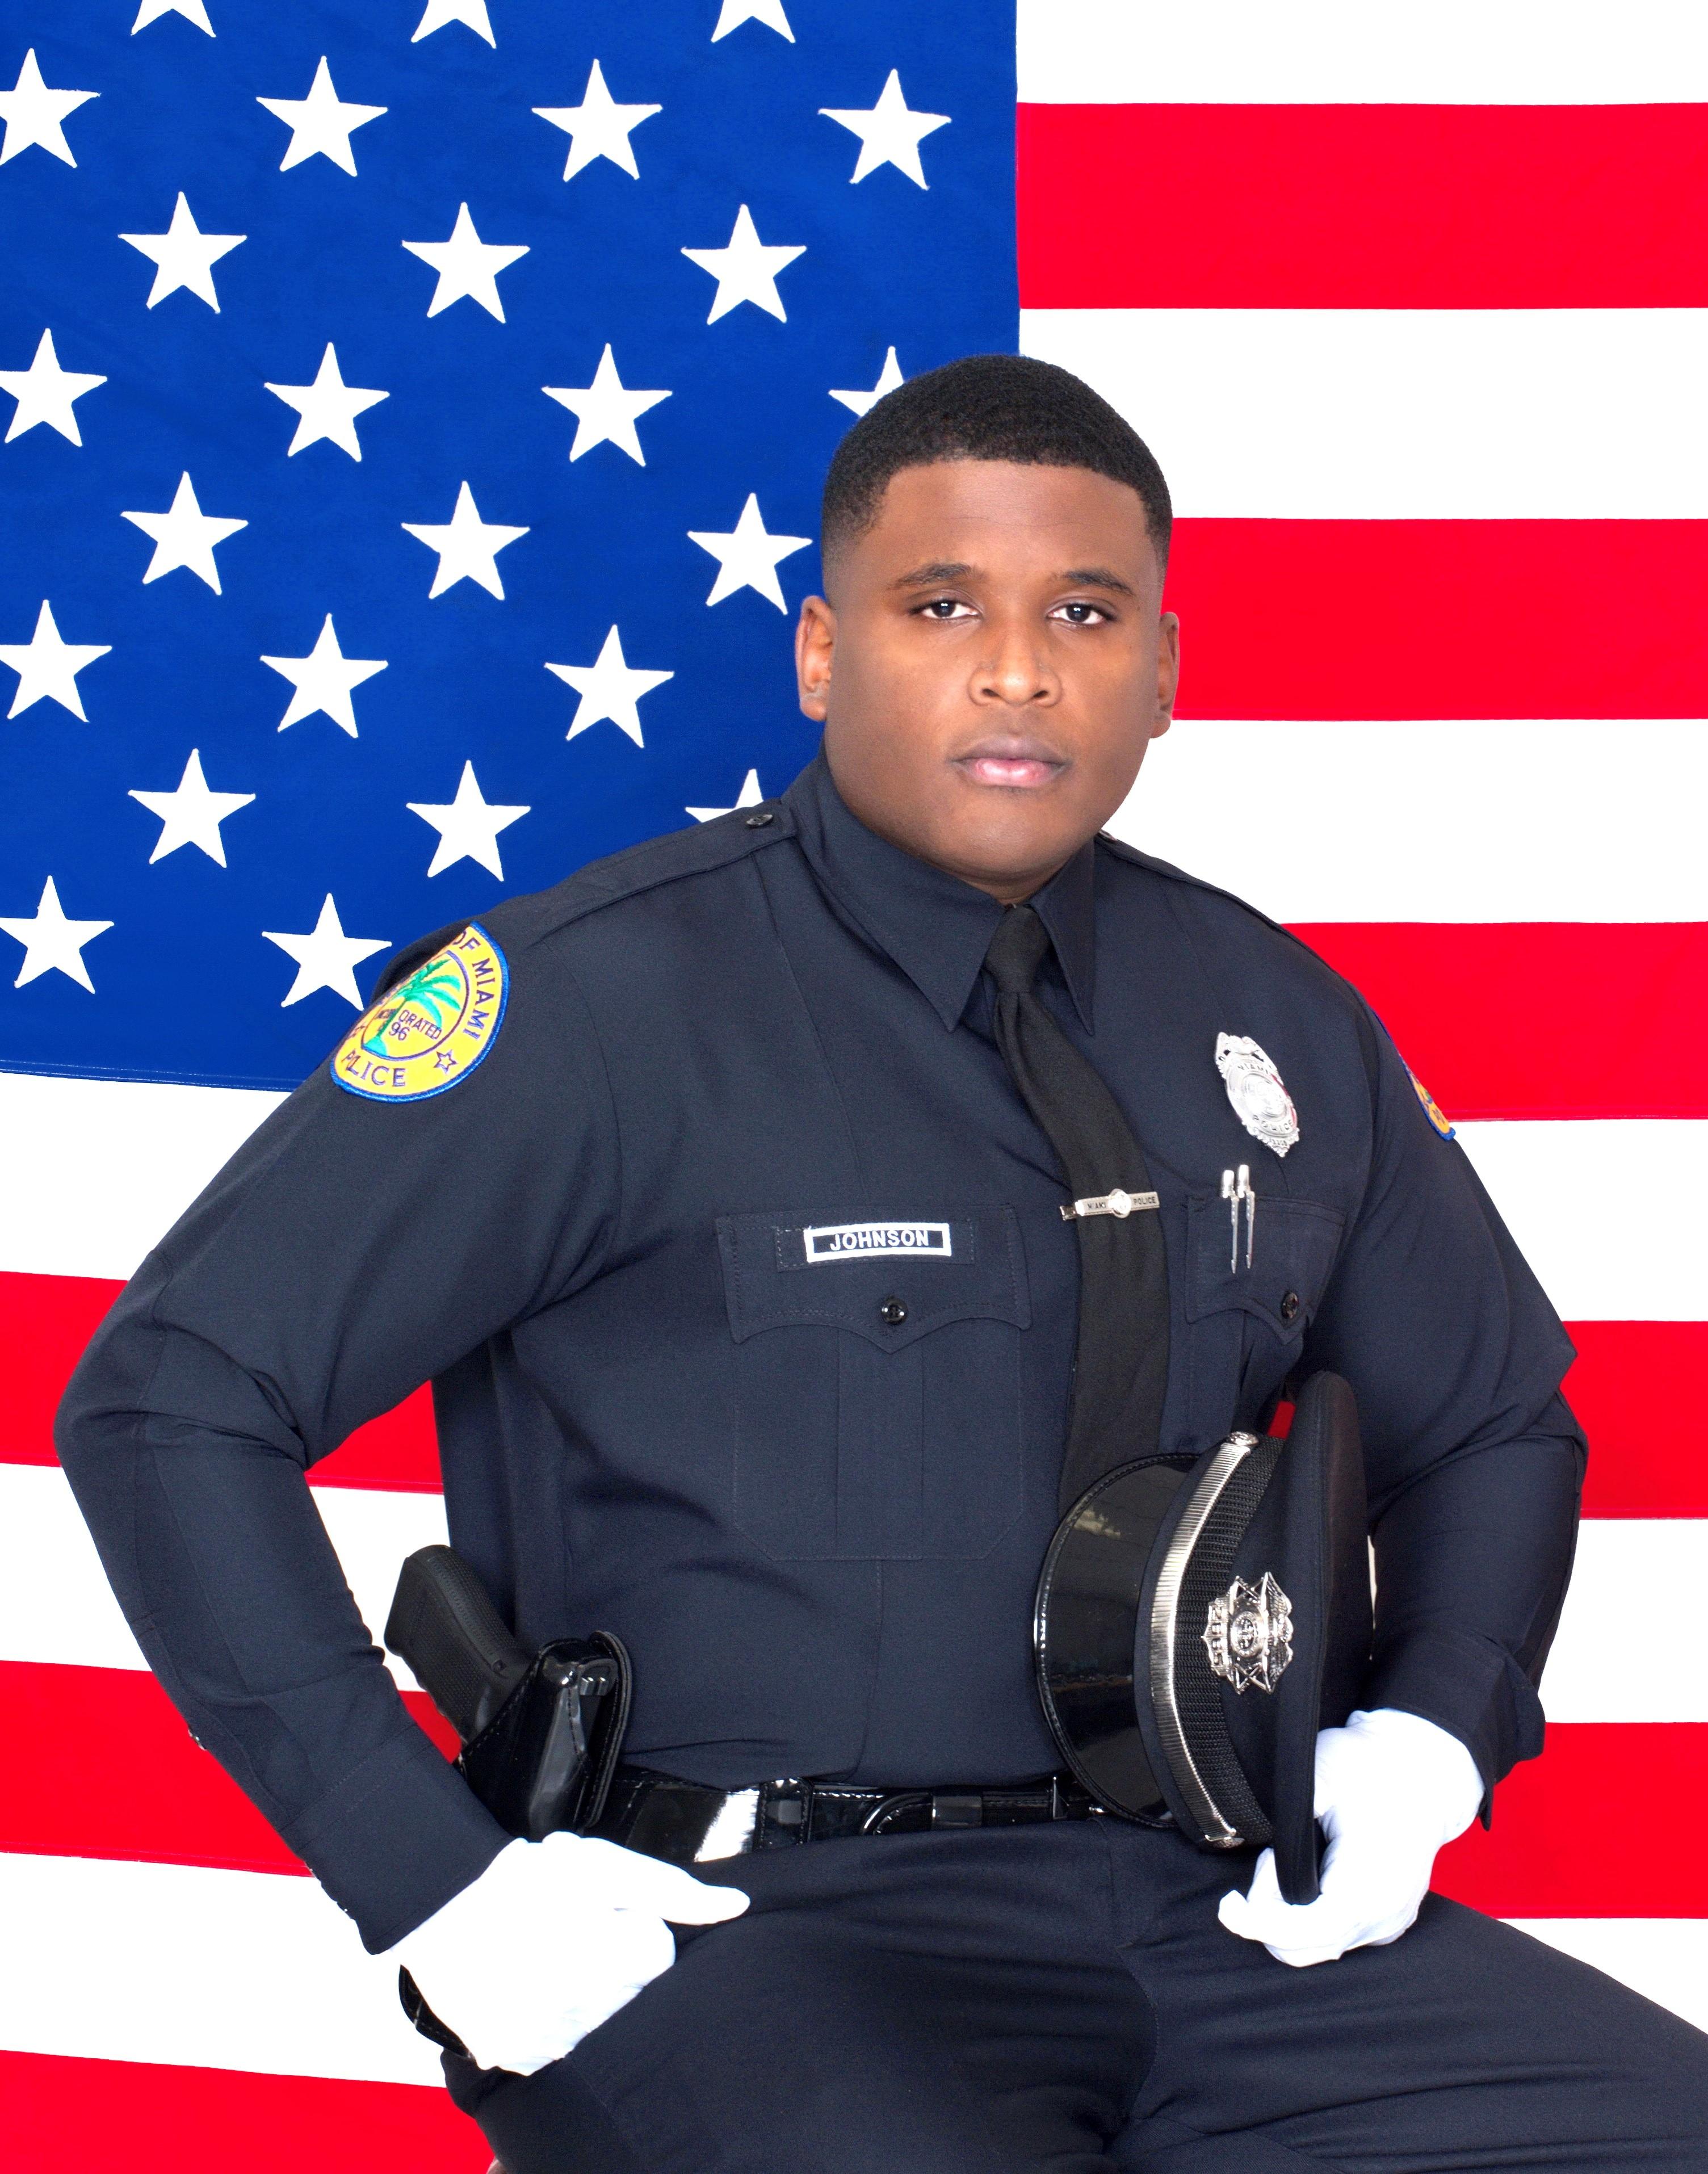 Police Officer Aubrey Travis Johnson, Jr. | Miami Police Department, Florida